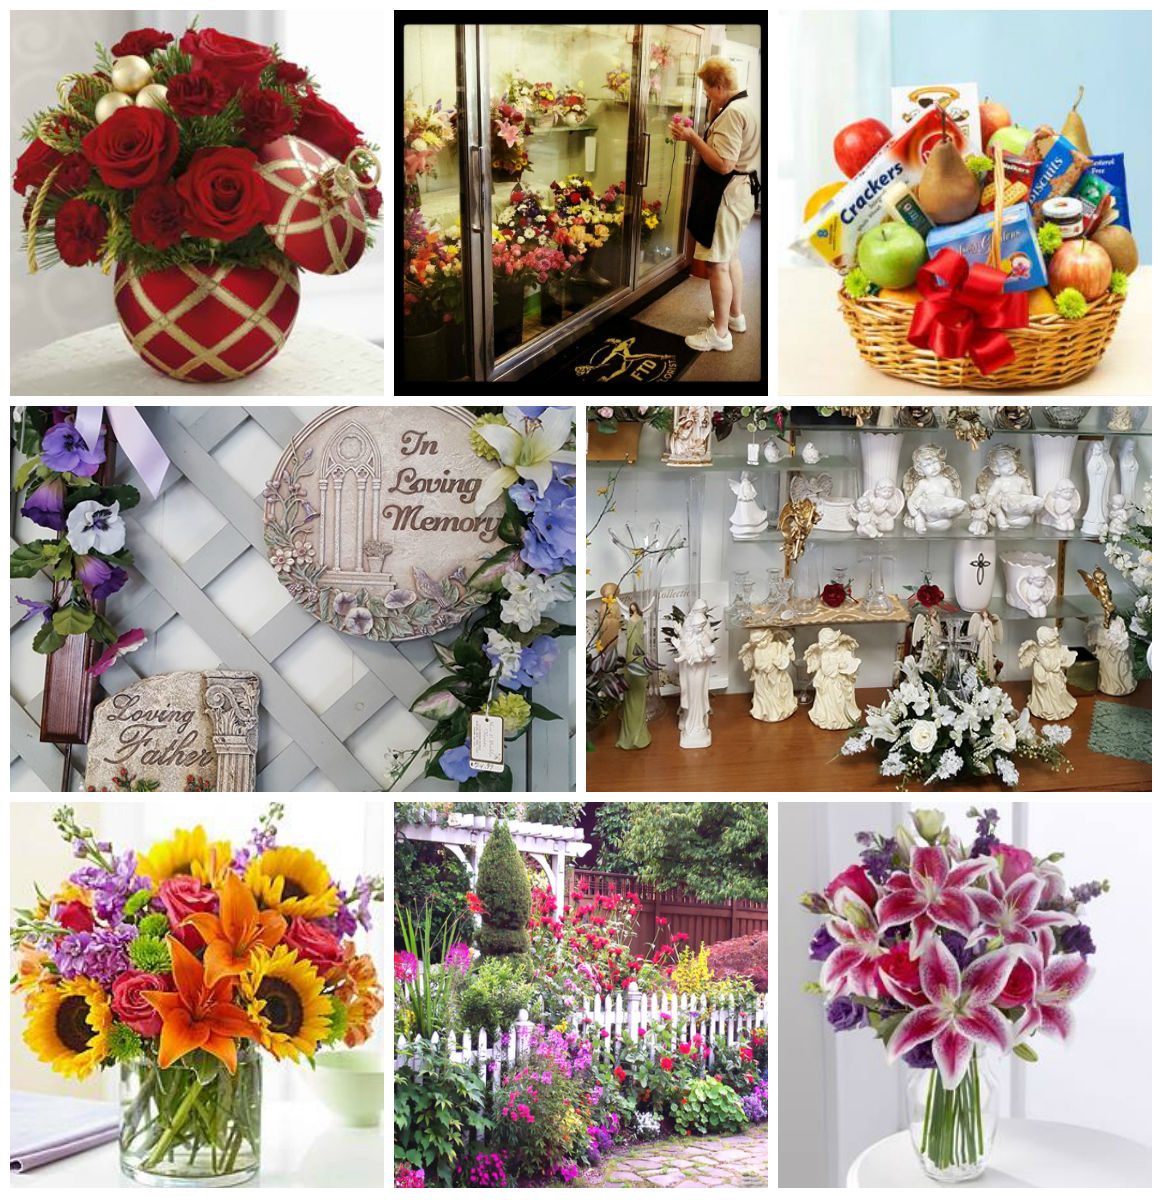 Shaw and boehler florist flowers anniversary auburn ny auburn florist izmirmasajfo